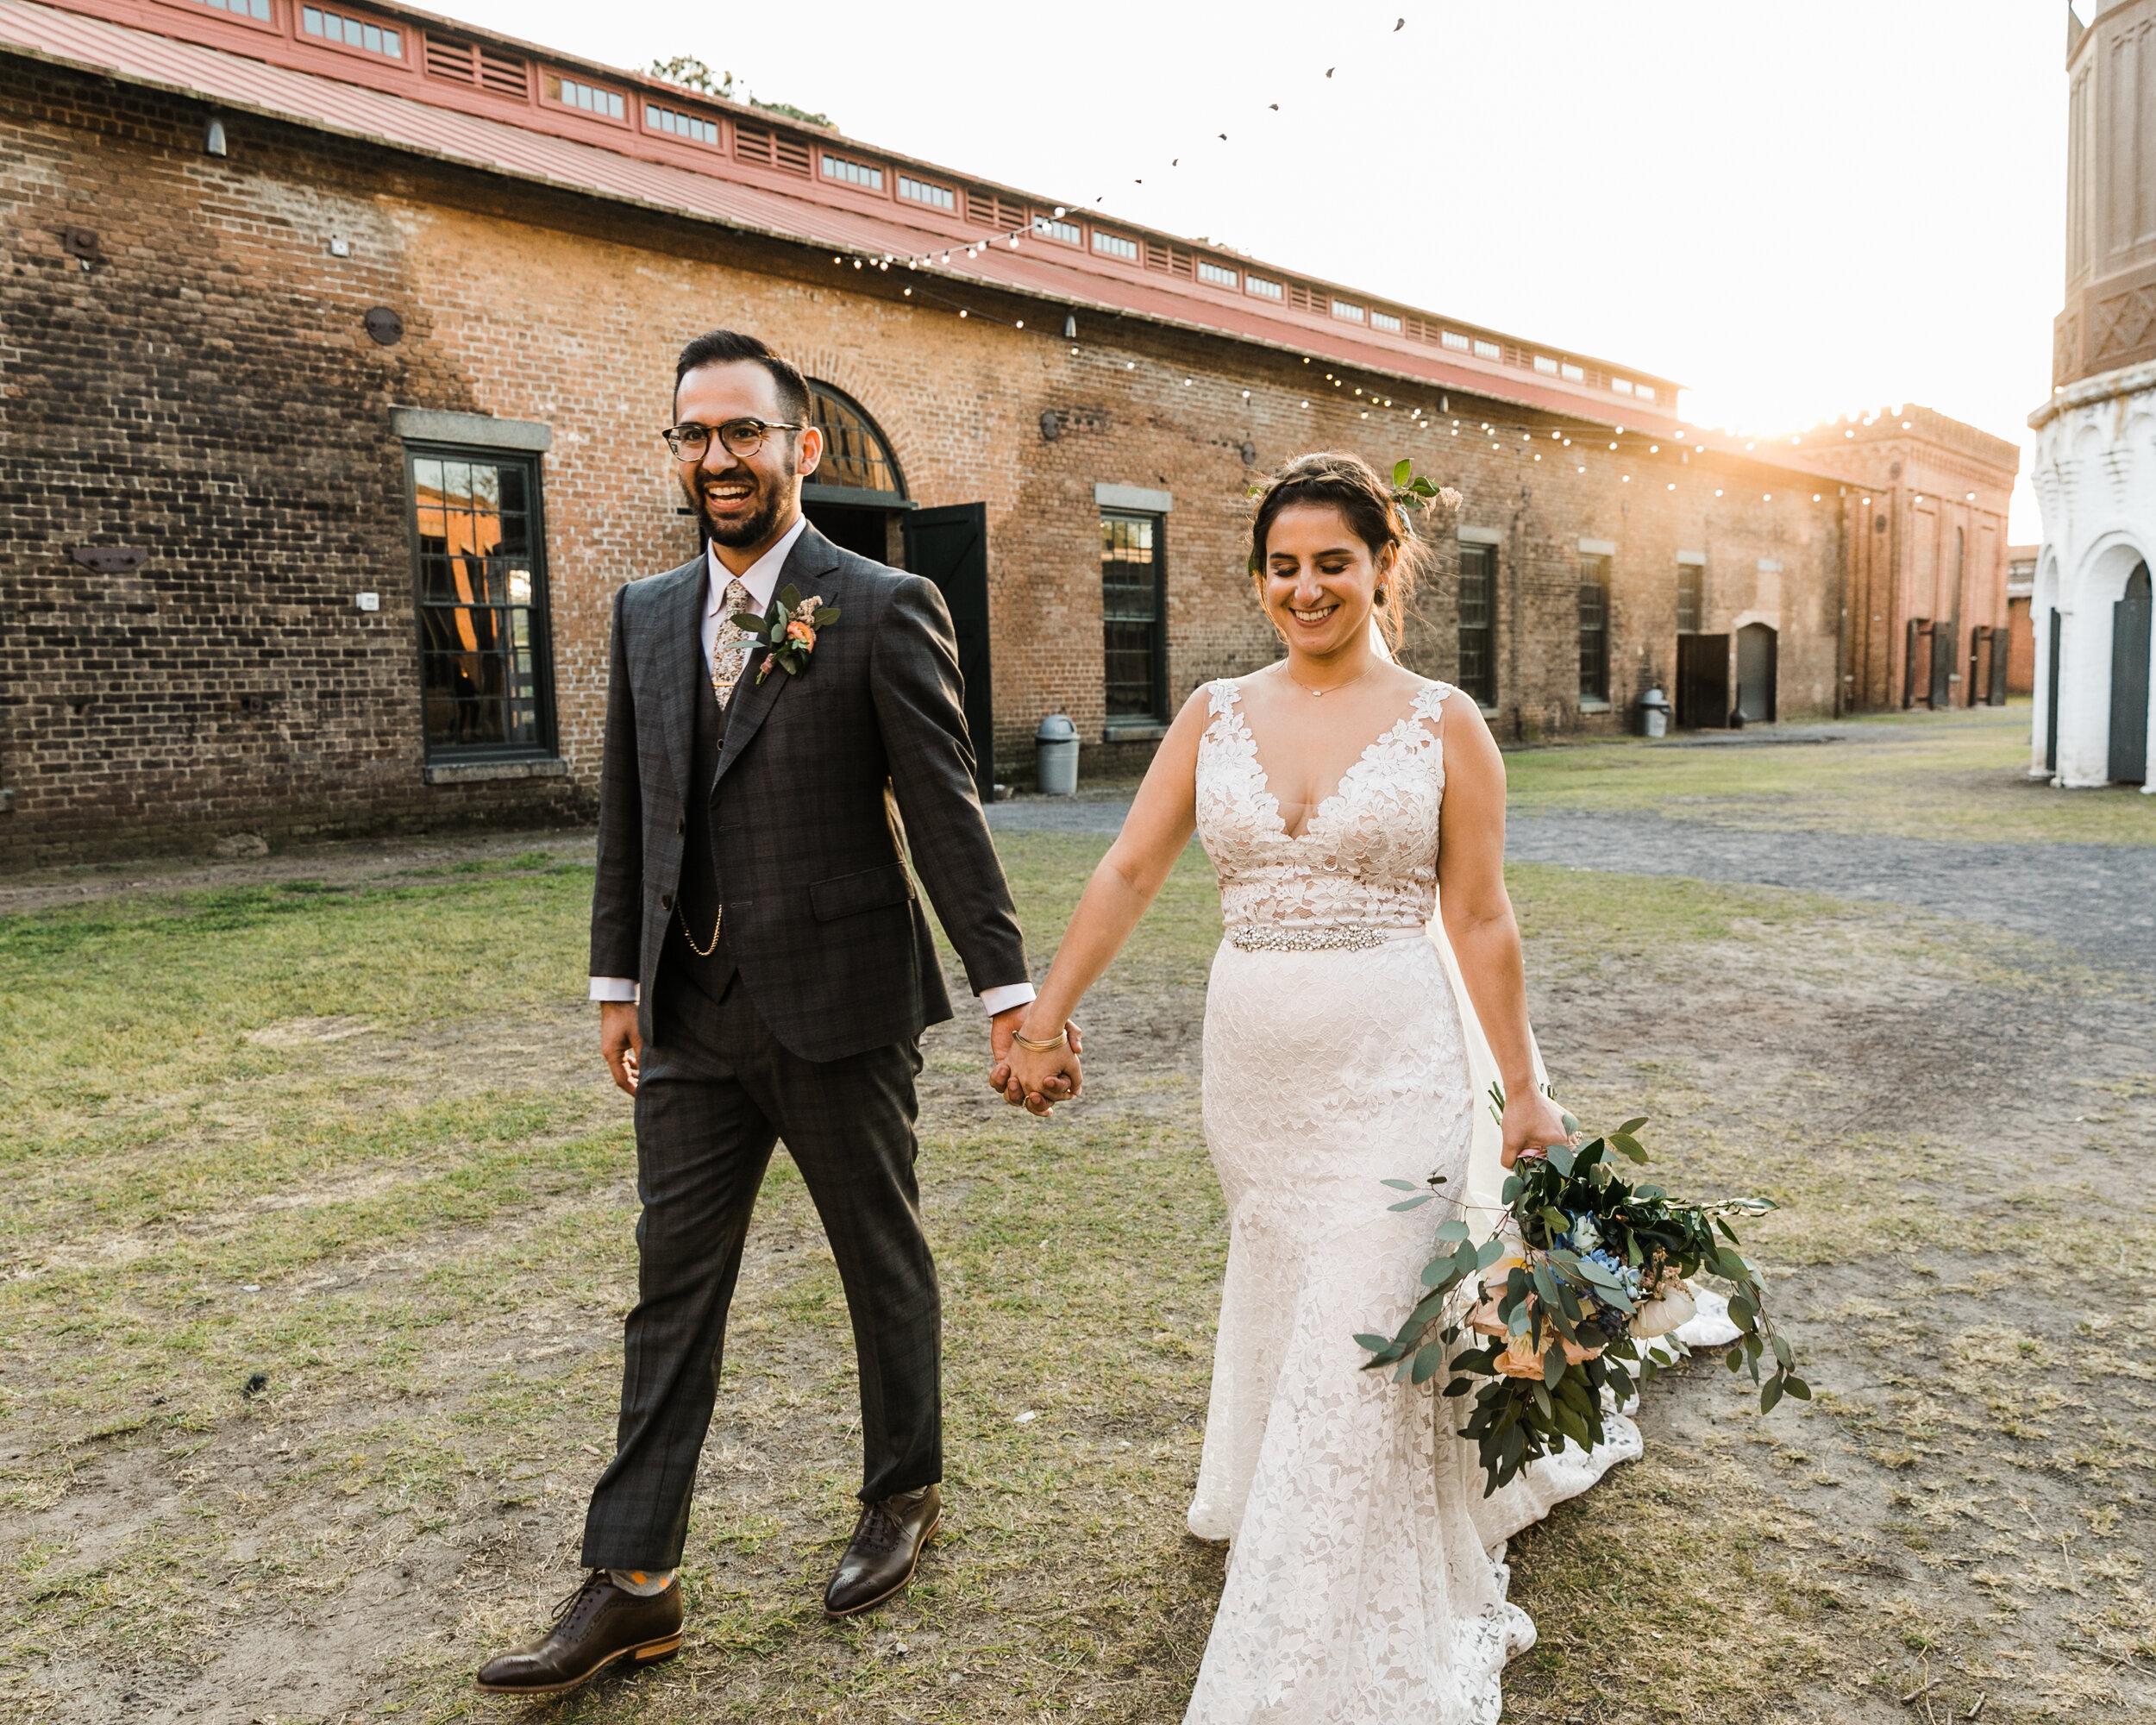 ivory-and-beau-blog-weddings-ivory-and-beau-couple-dominique-and-andres-savannah-florist-wedding-planning-savannah-bridal-boutique-wedding-flowers-KIP_WEBERWEDDING_RAILROADMUSEUM-1314.JPG